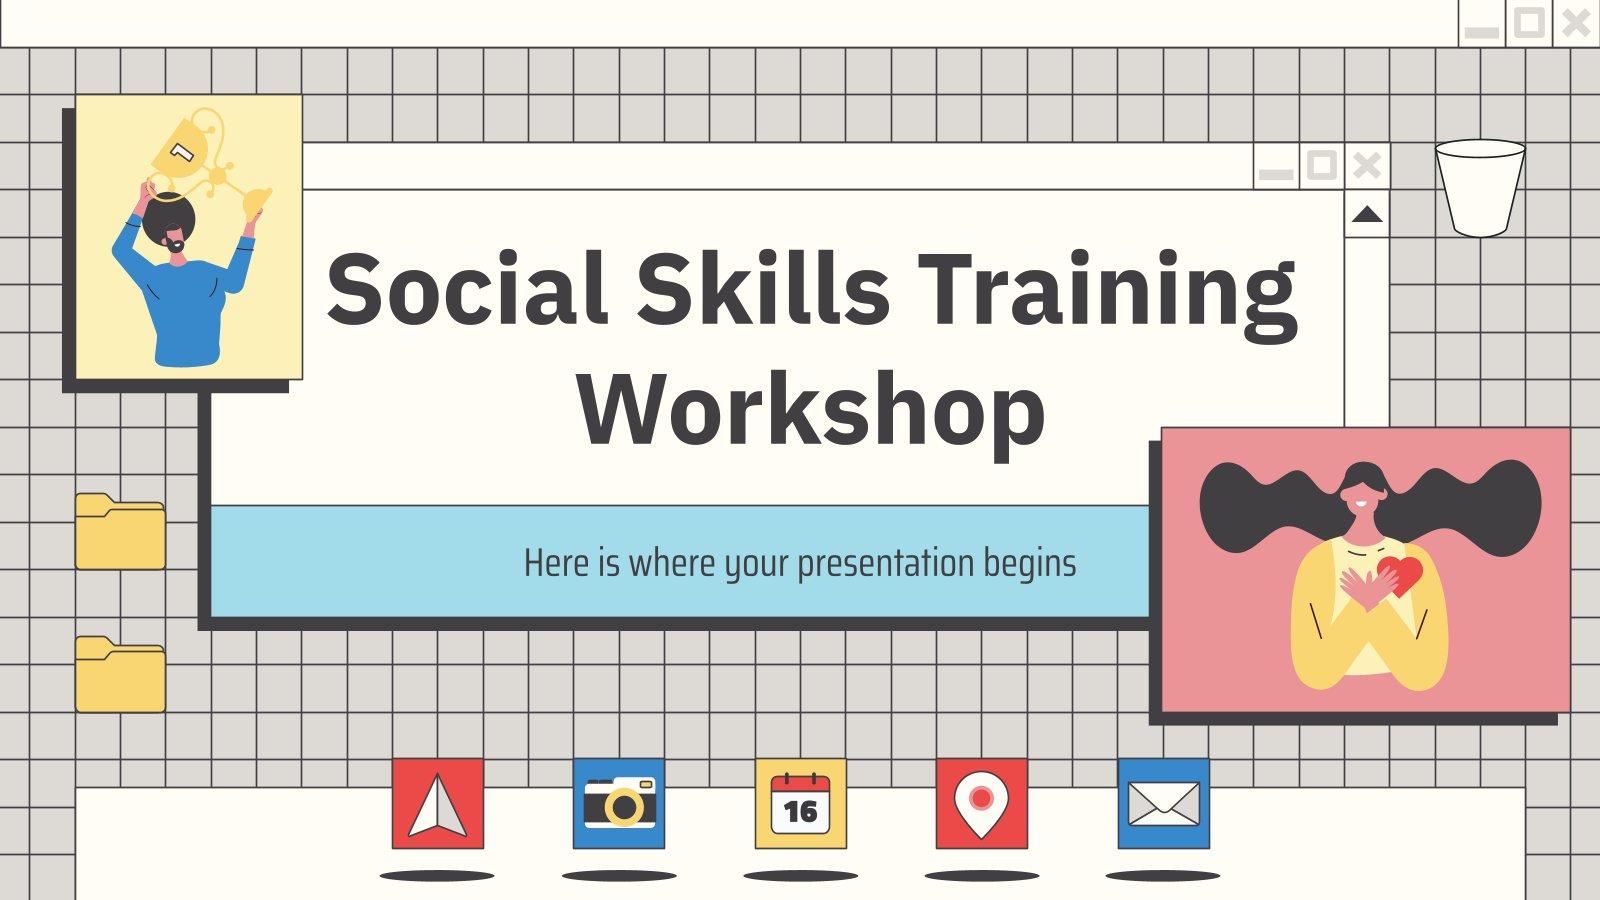 Social Skills Training Workshop presentation template